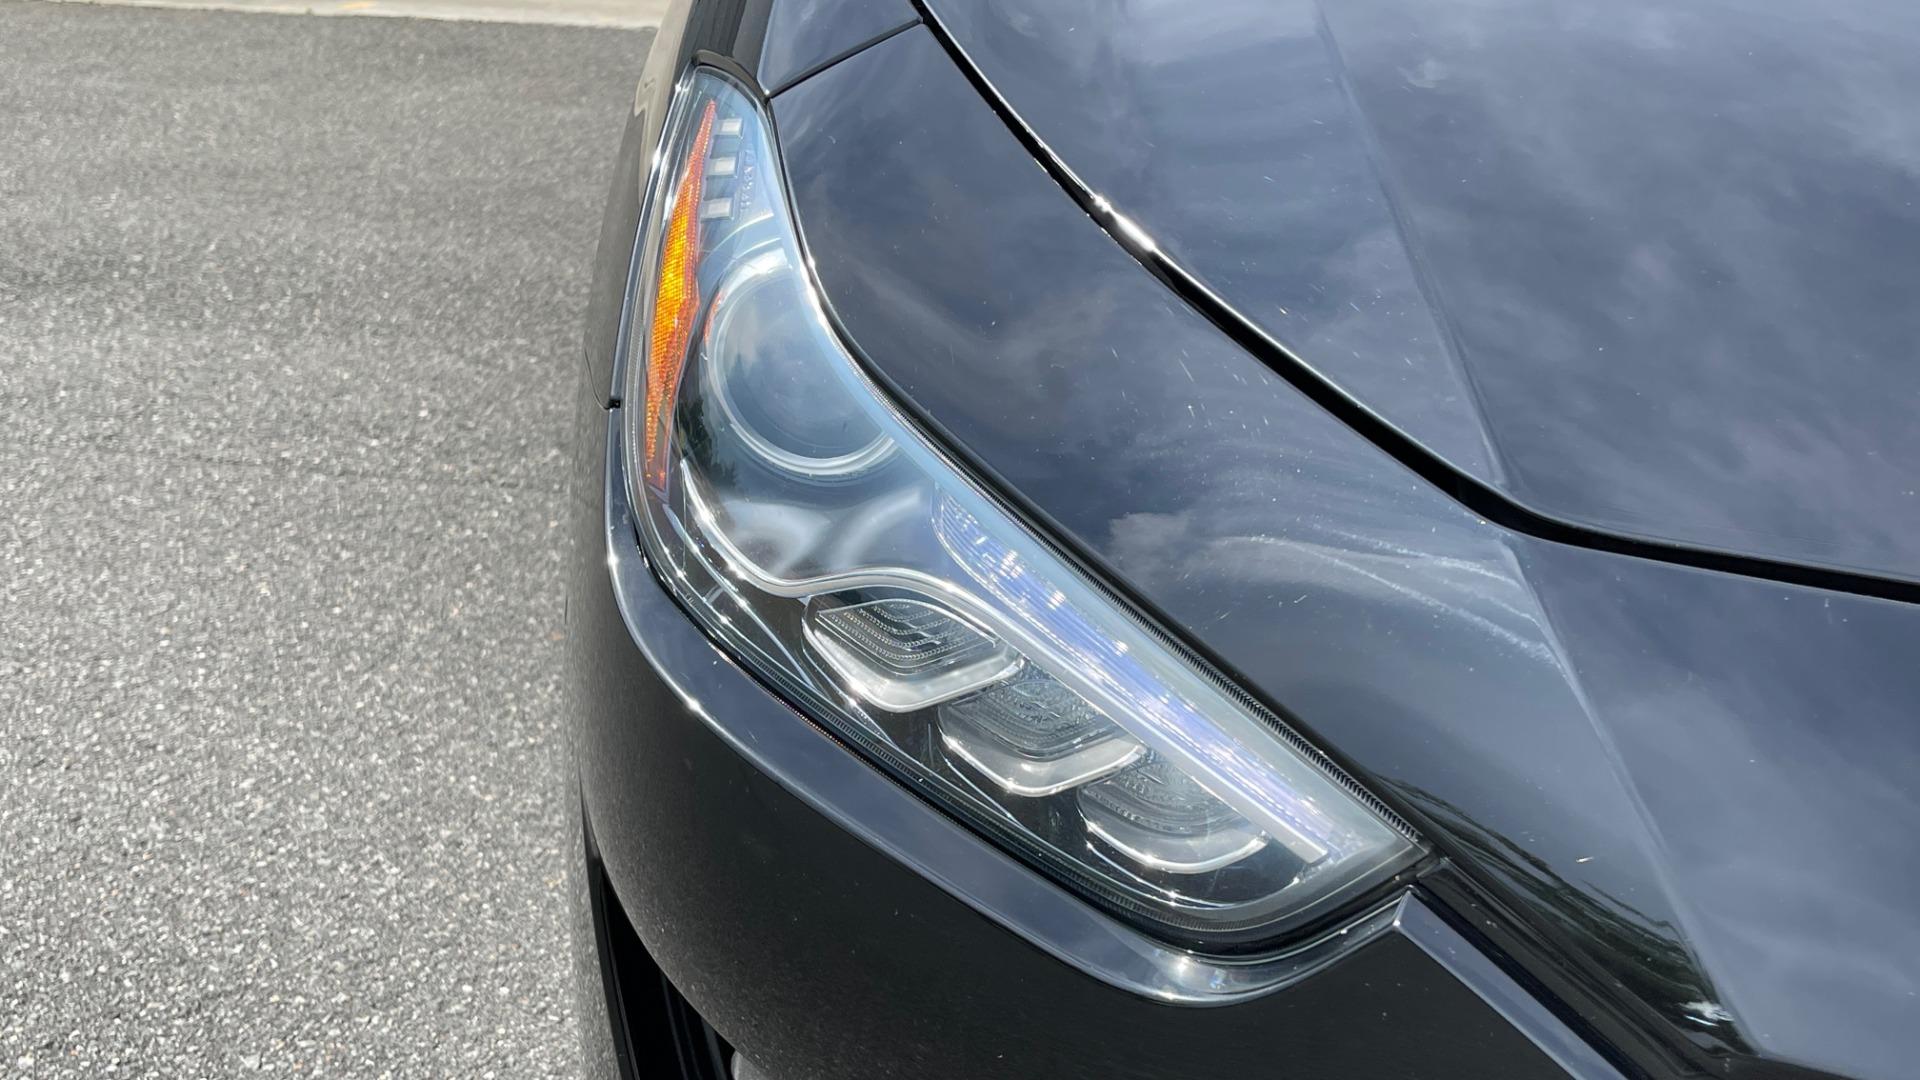 Used 2018 Maserati GHIBLI 3.0L SEDAN / 8-SPD AUTO / NAV / SUNROOF / REARVIEW for sale $42,995 at Formula Imports in Charlotte NC 28227 15